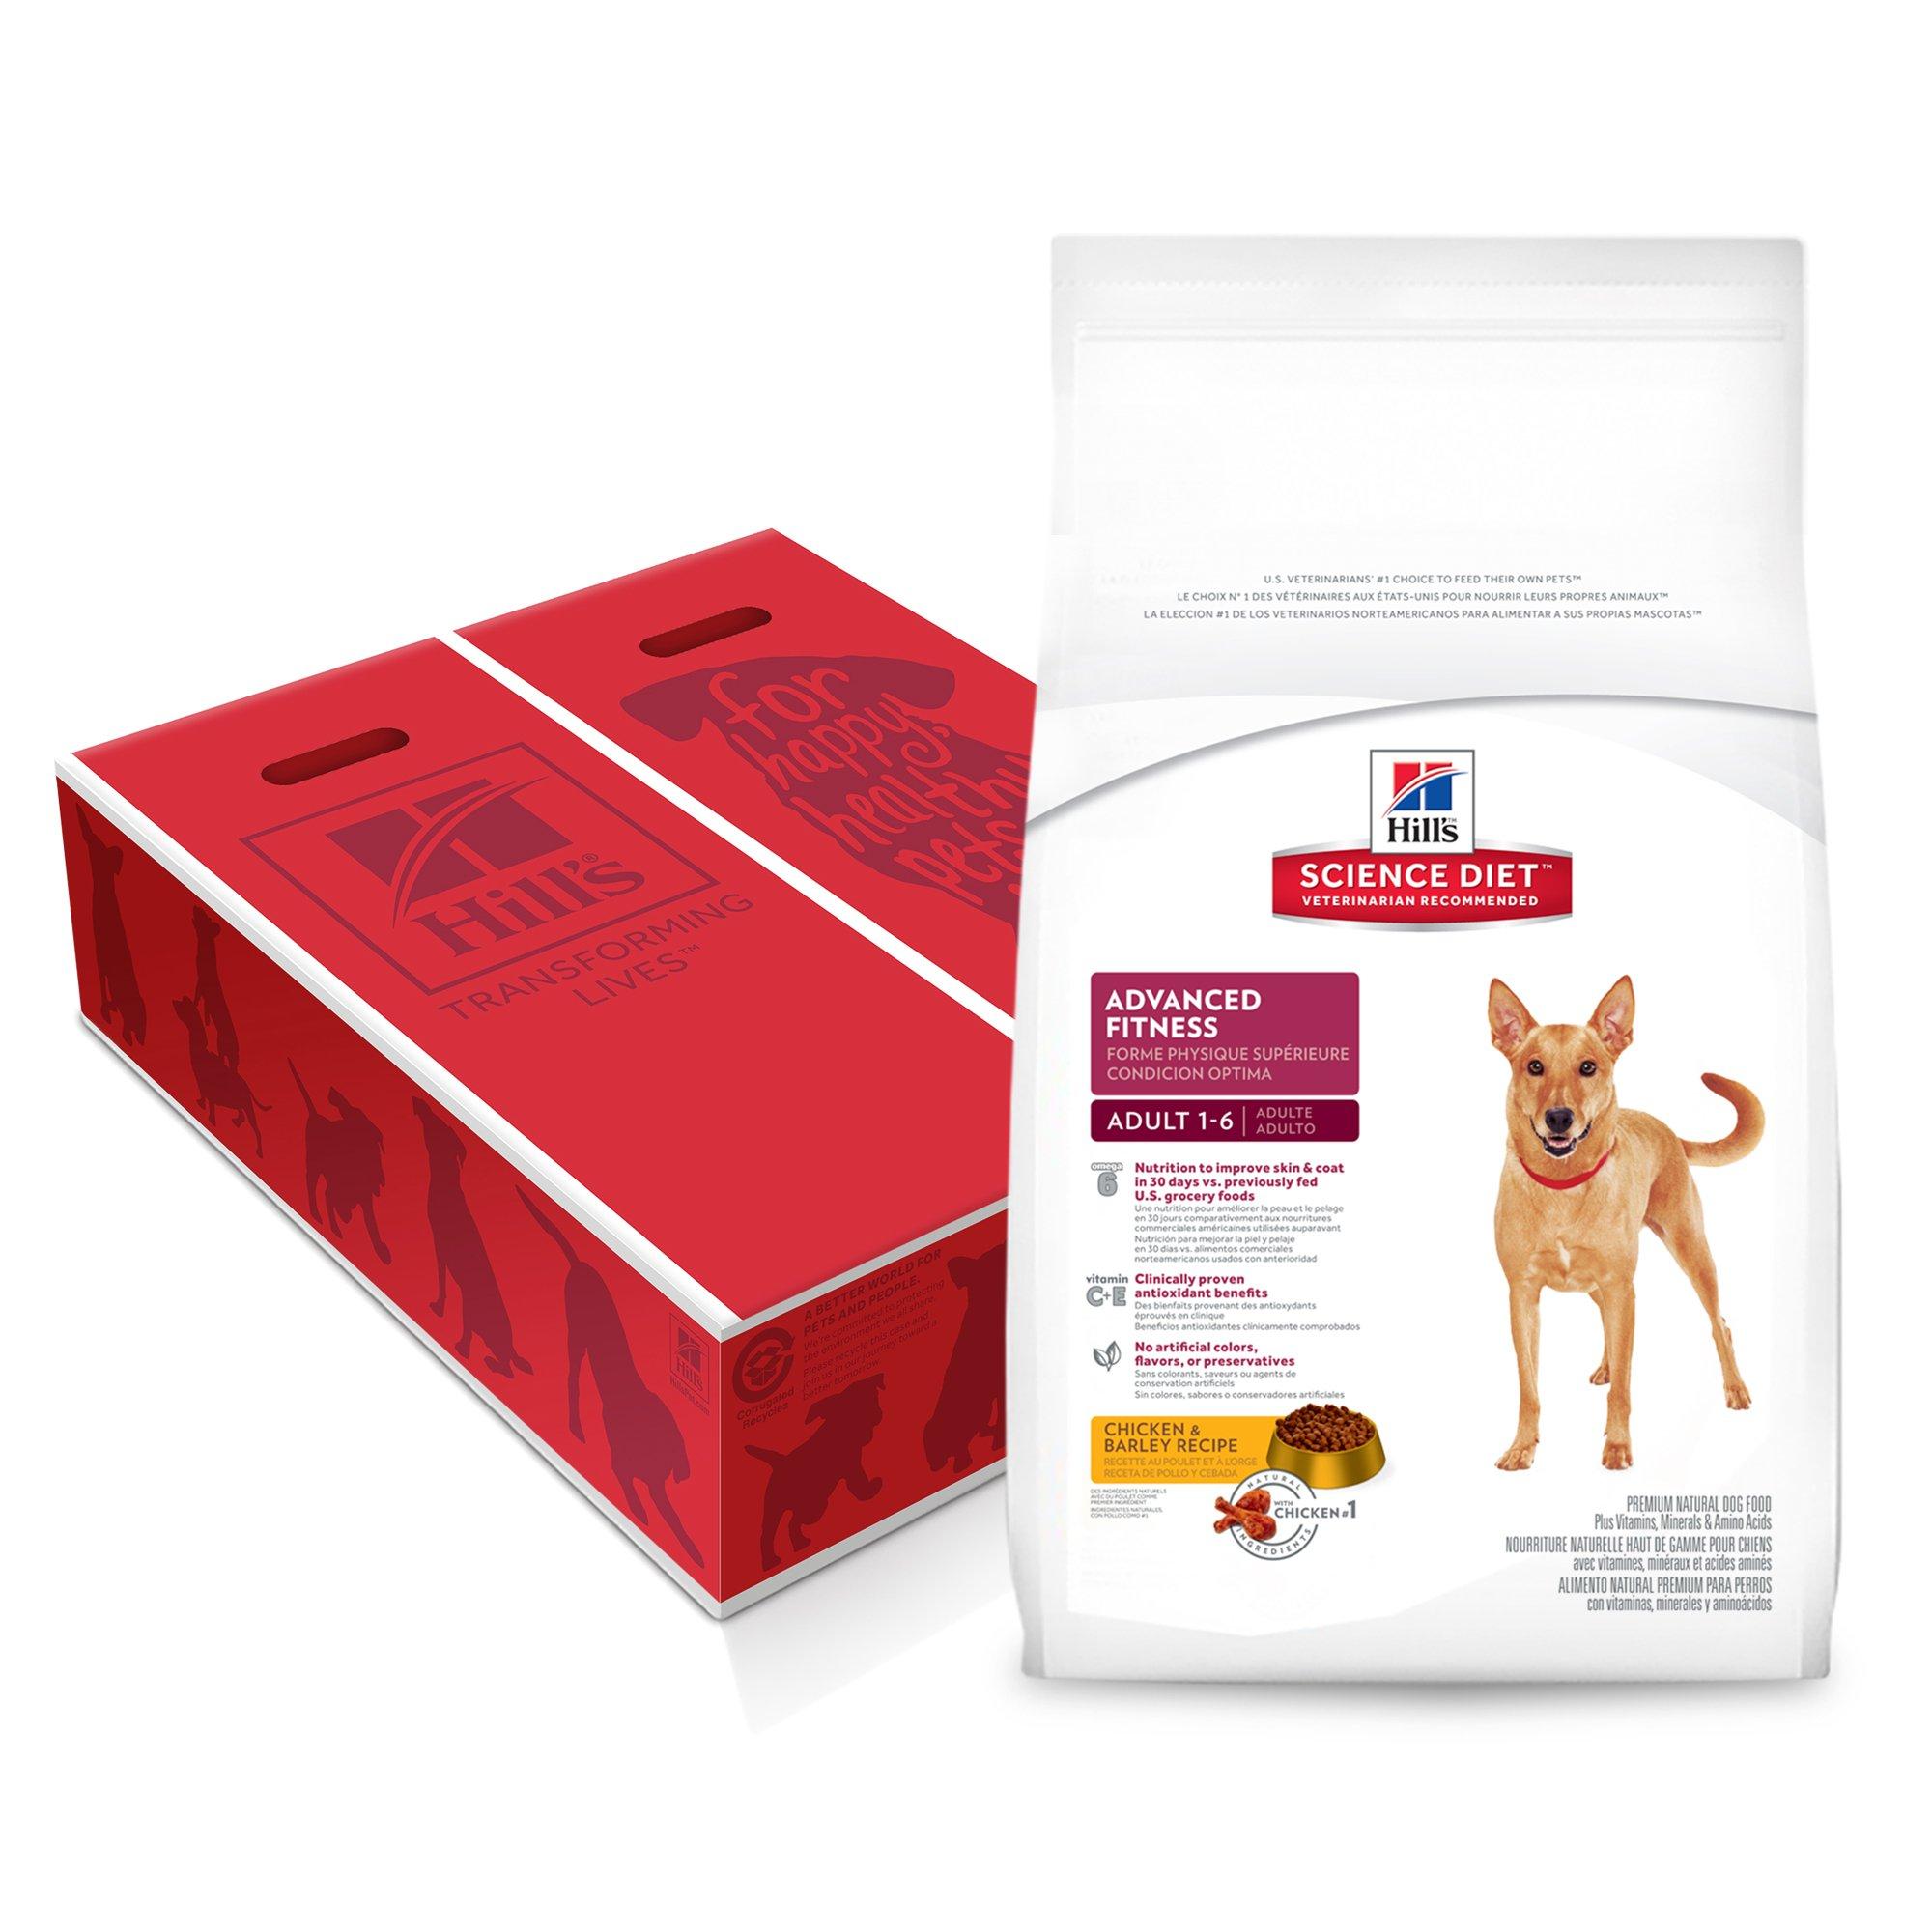 Hills Science Diet Adult Advanced Fitness Dry Dog Food